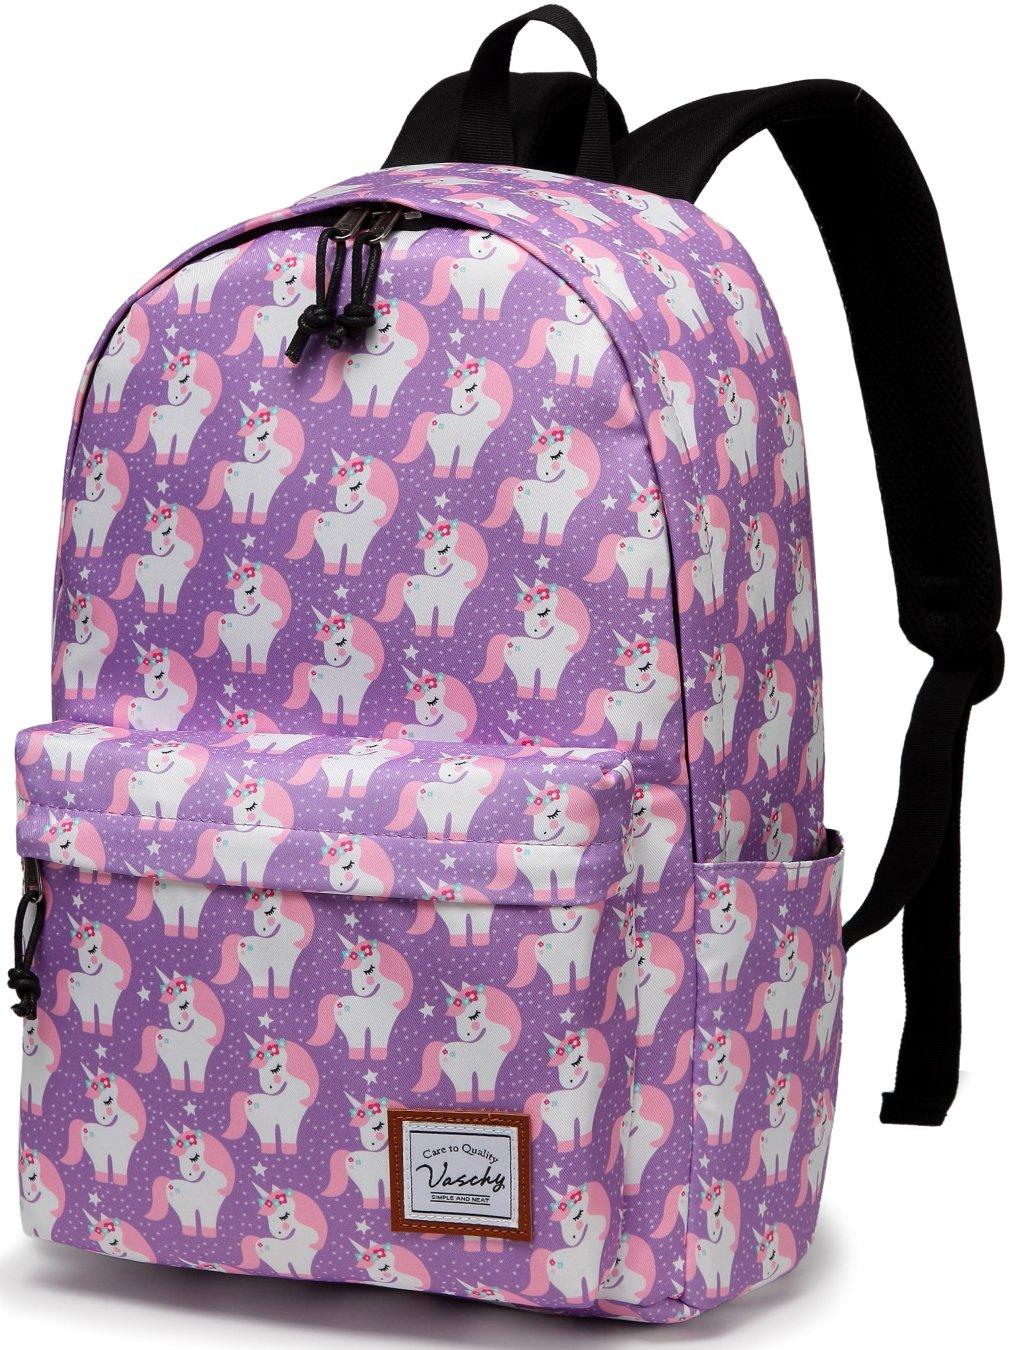 School Backpacks for Girls,VASCHY Cute Lightweight Water-Resistant 14in Padded Laptop Sleeve in Pink Unicorn